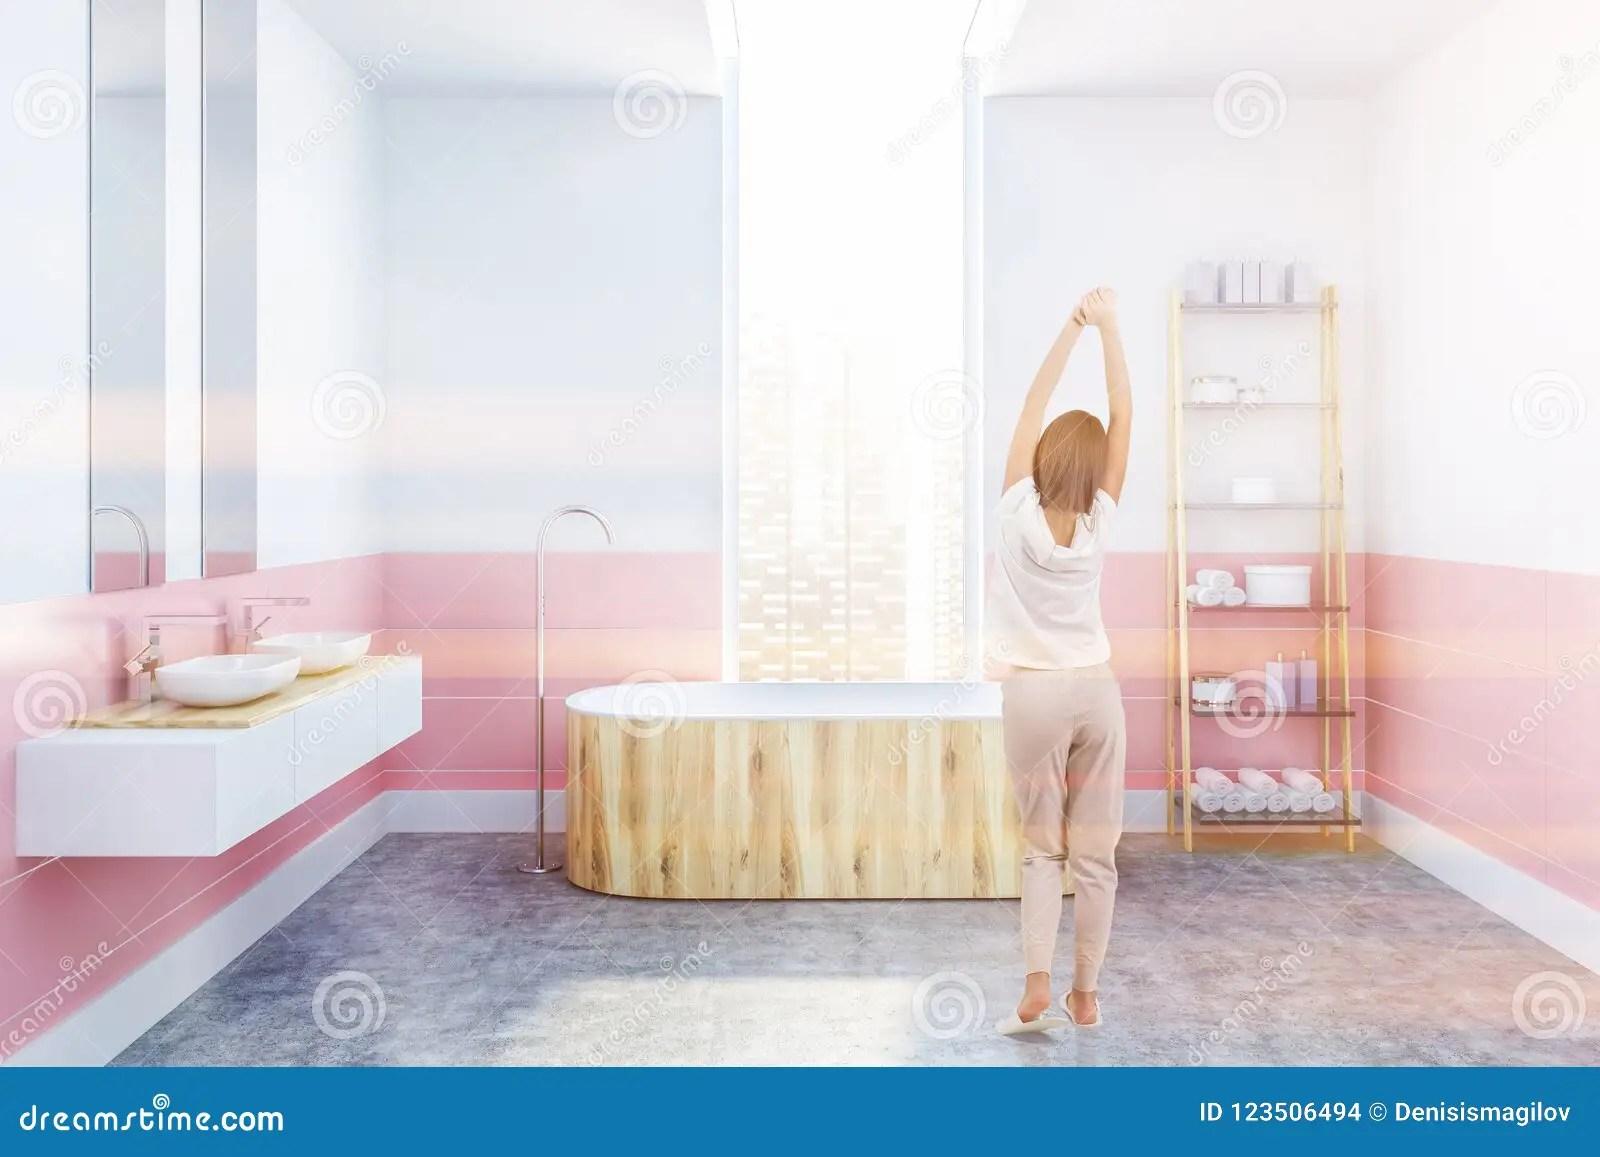 https fr dreamstime com salle bains blanche rose baquet en bois fille image123506494